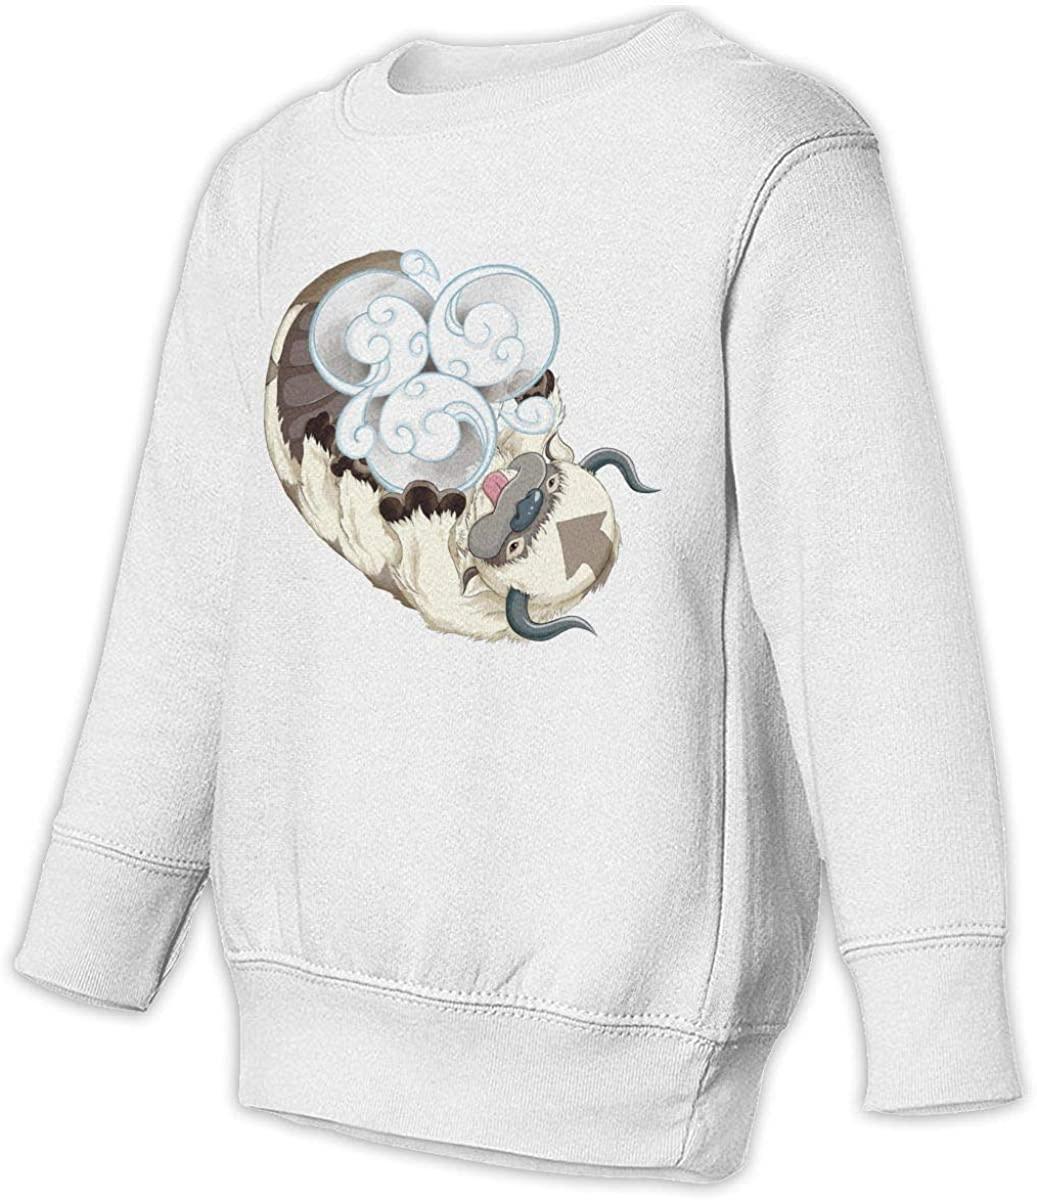 1836 Avatar The Last Airbender Appa Unisex Sweatshirt Youth Boy and Girls Pullover Sweatshirt